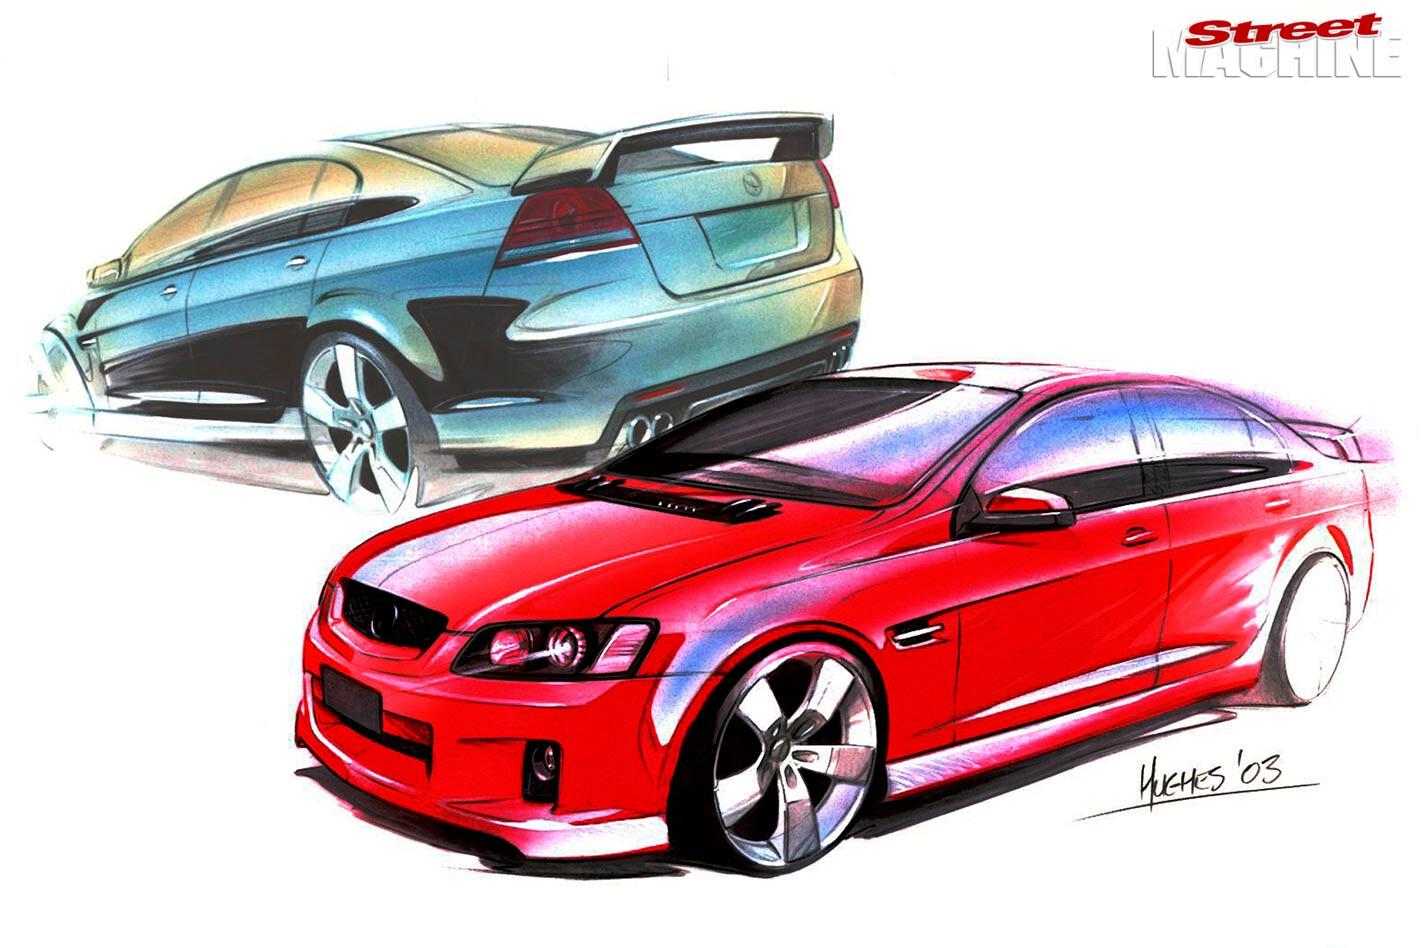 Holden Commodore sketch